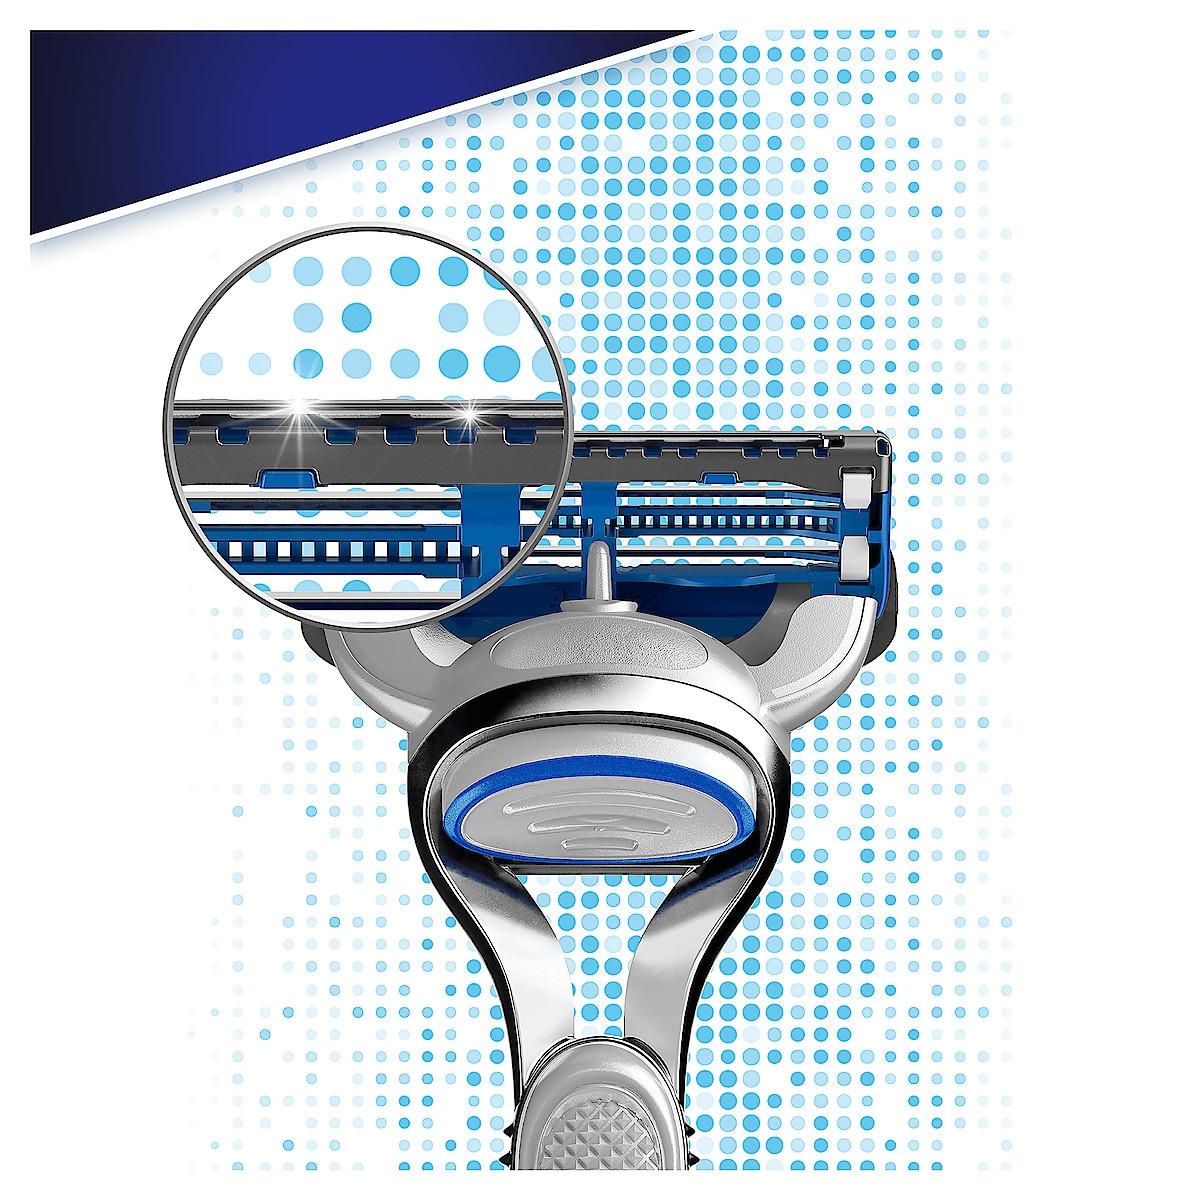 Rakhyvel Gillette SkinGuard Sensitive + 2 rakblad